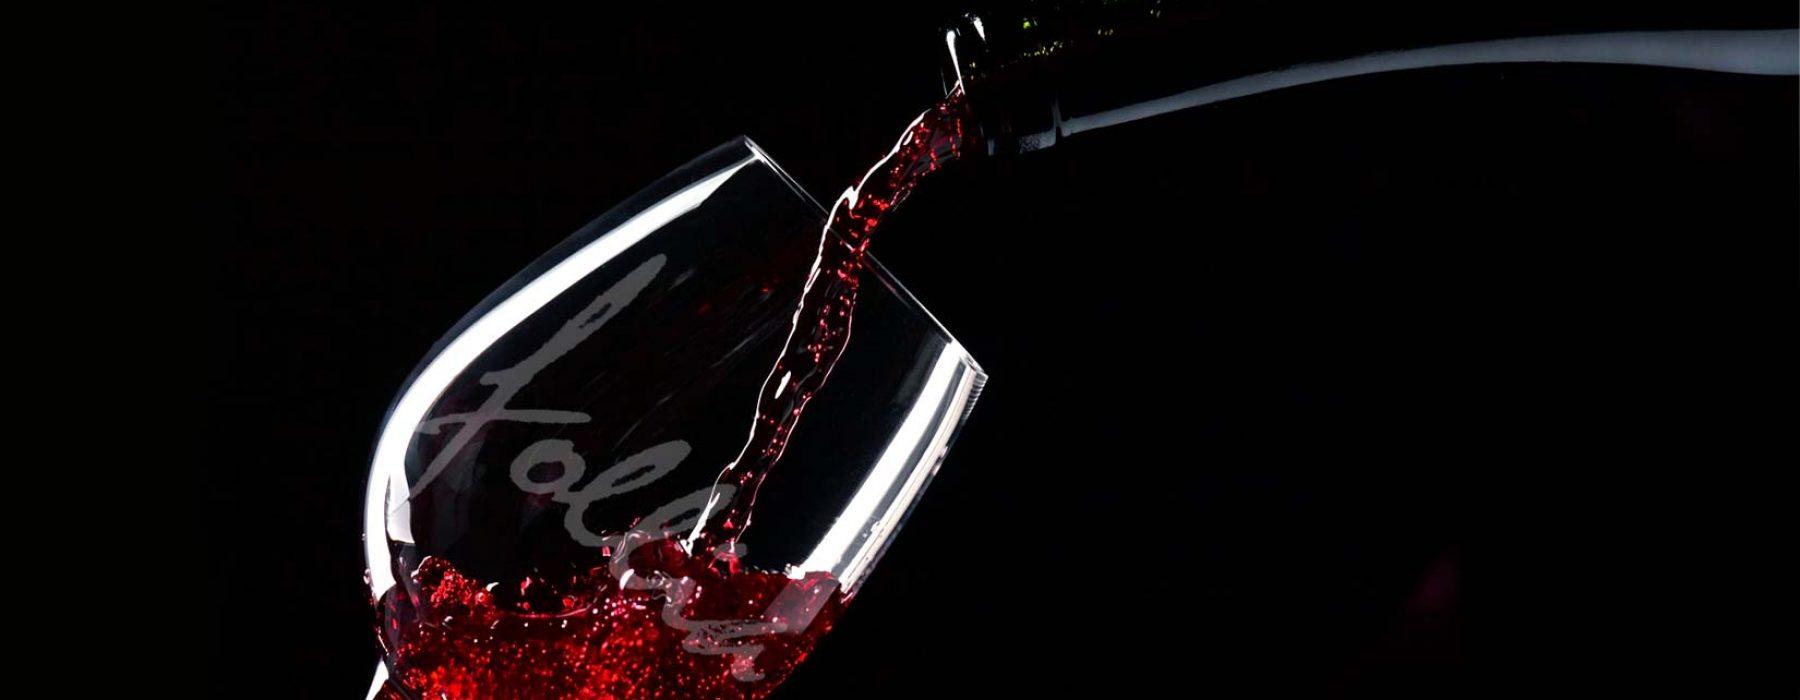 Piana dei Castelli:用爱酿造的红酒